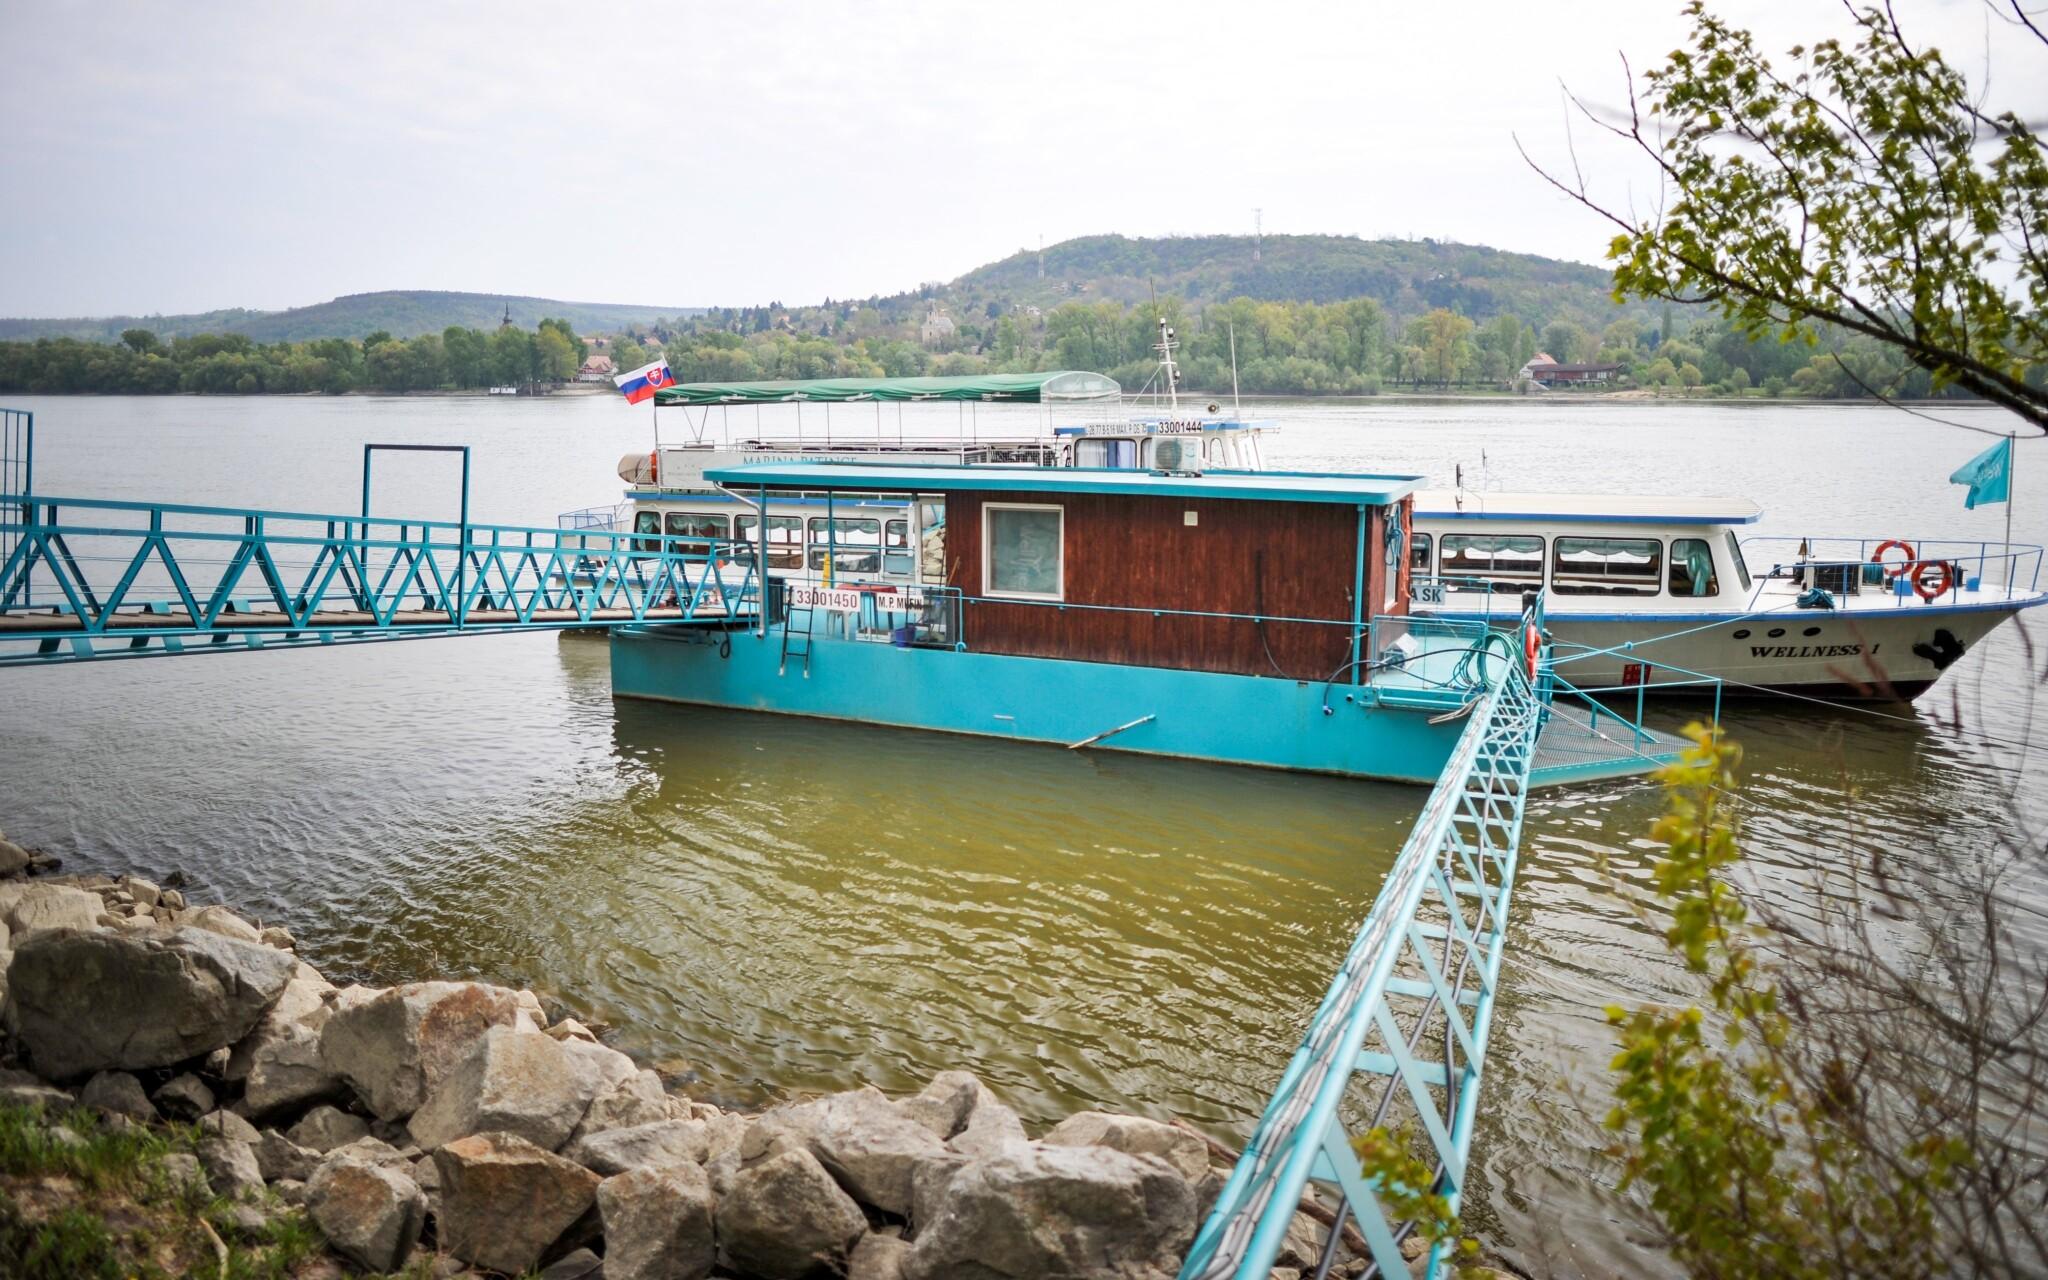 Užijte si plavu po Dunaji, přístav, Wellness hotel Patince